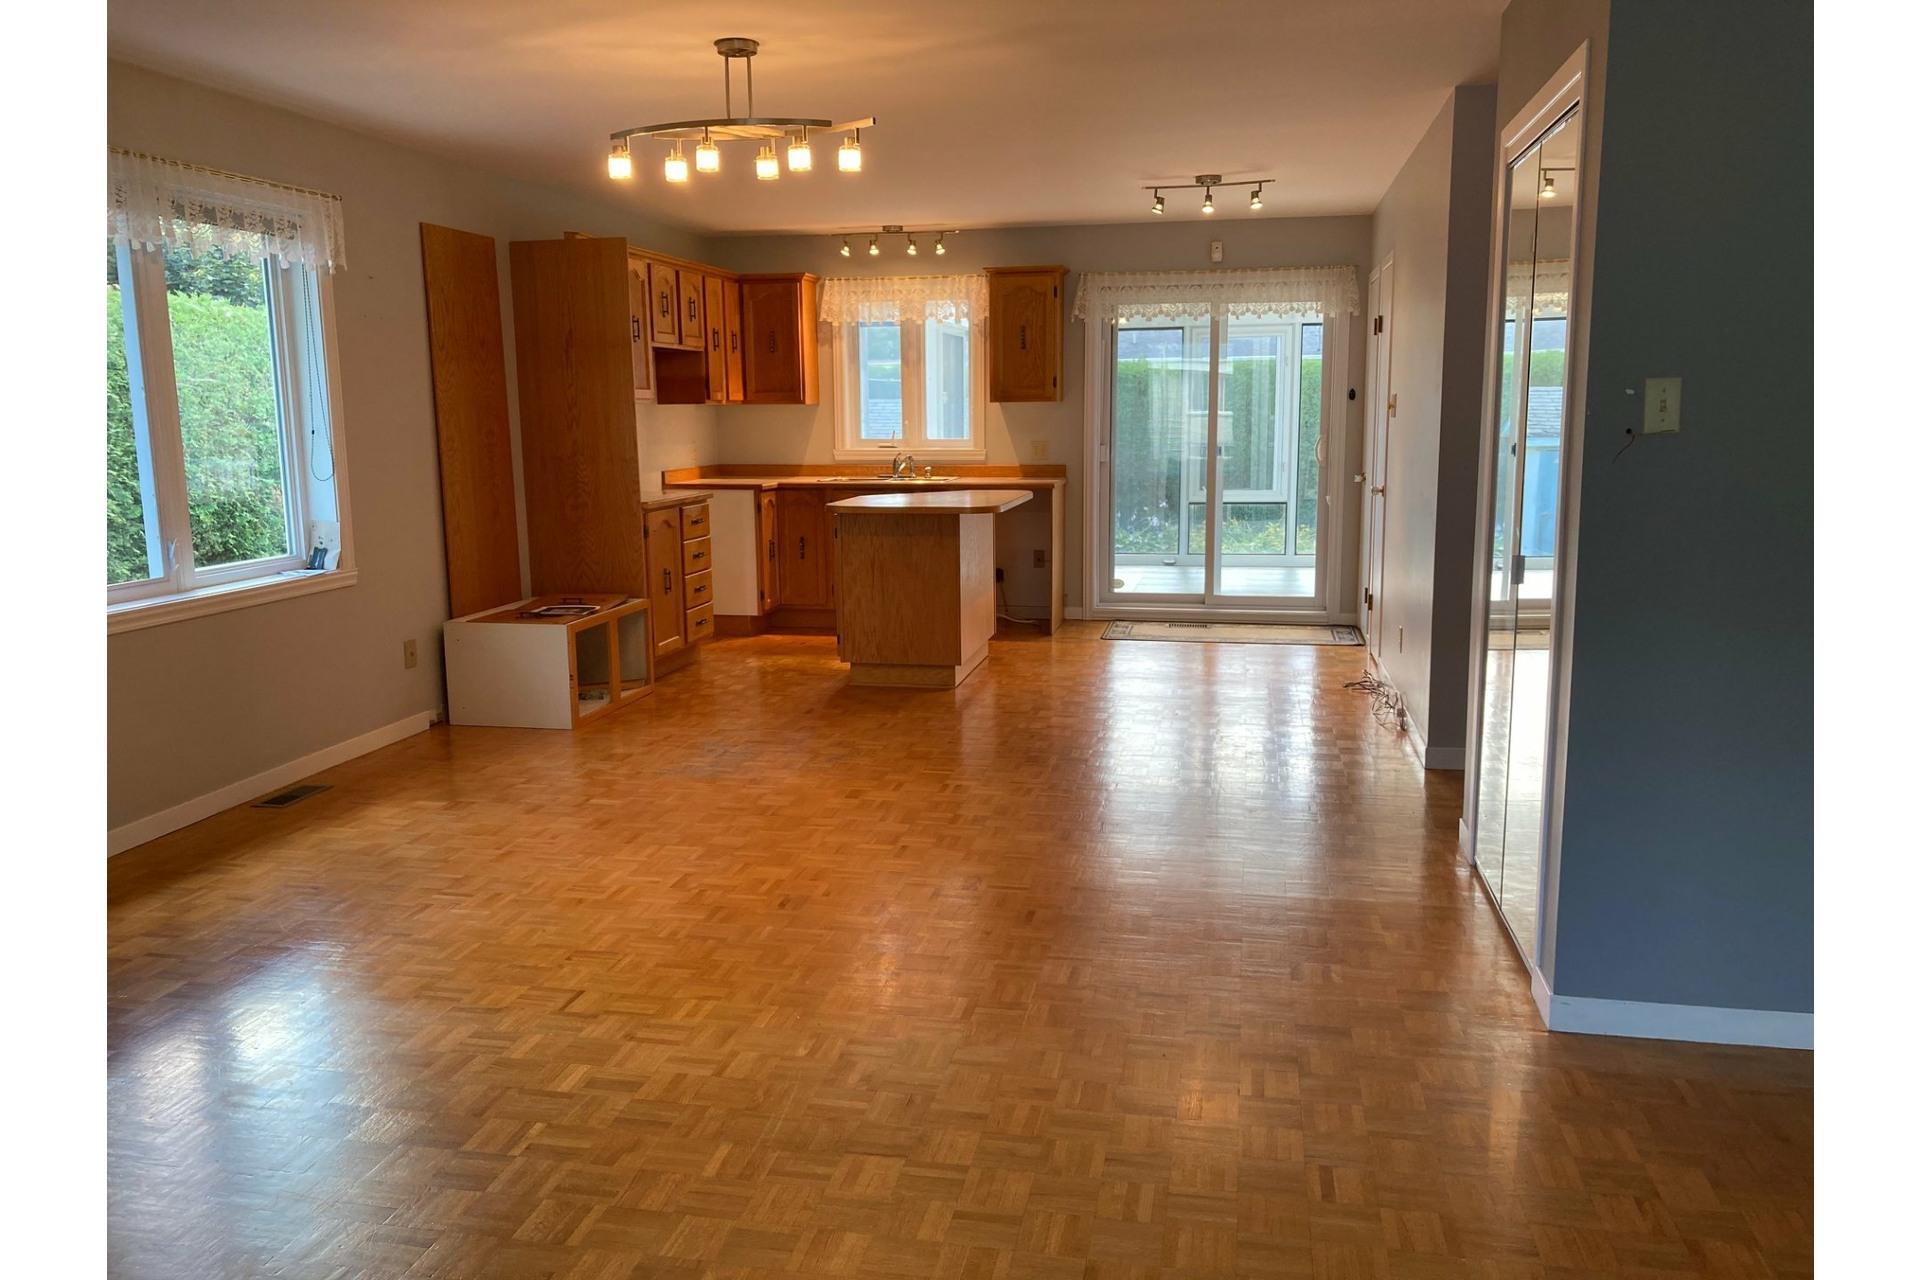 image 9 - House For sale Joliette - 13 rooms